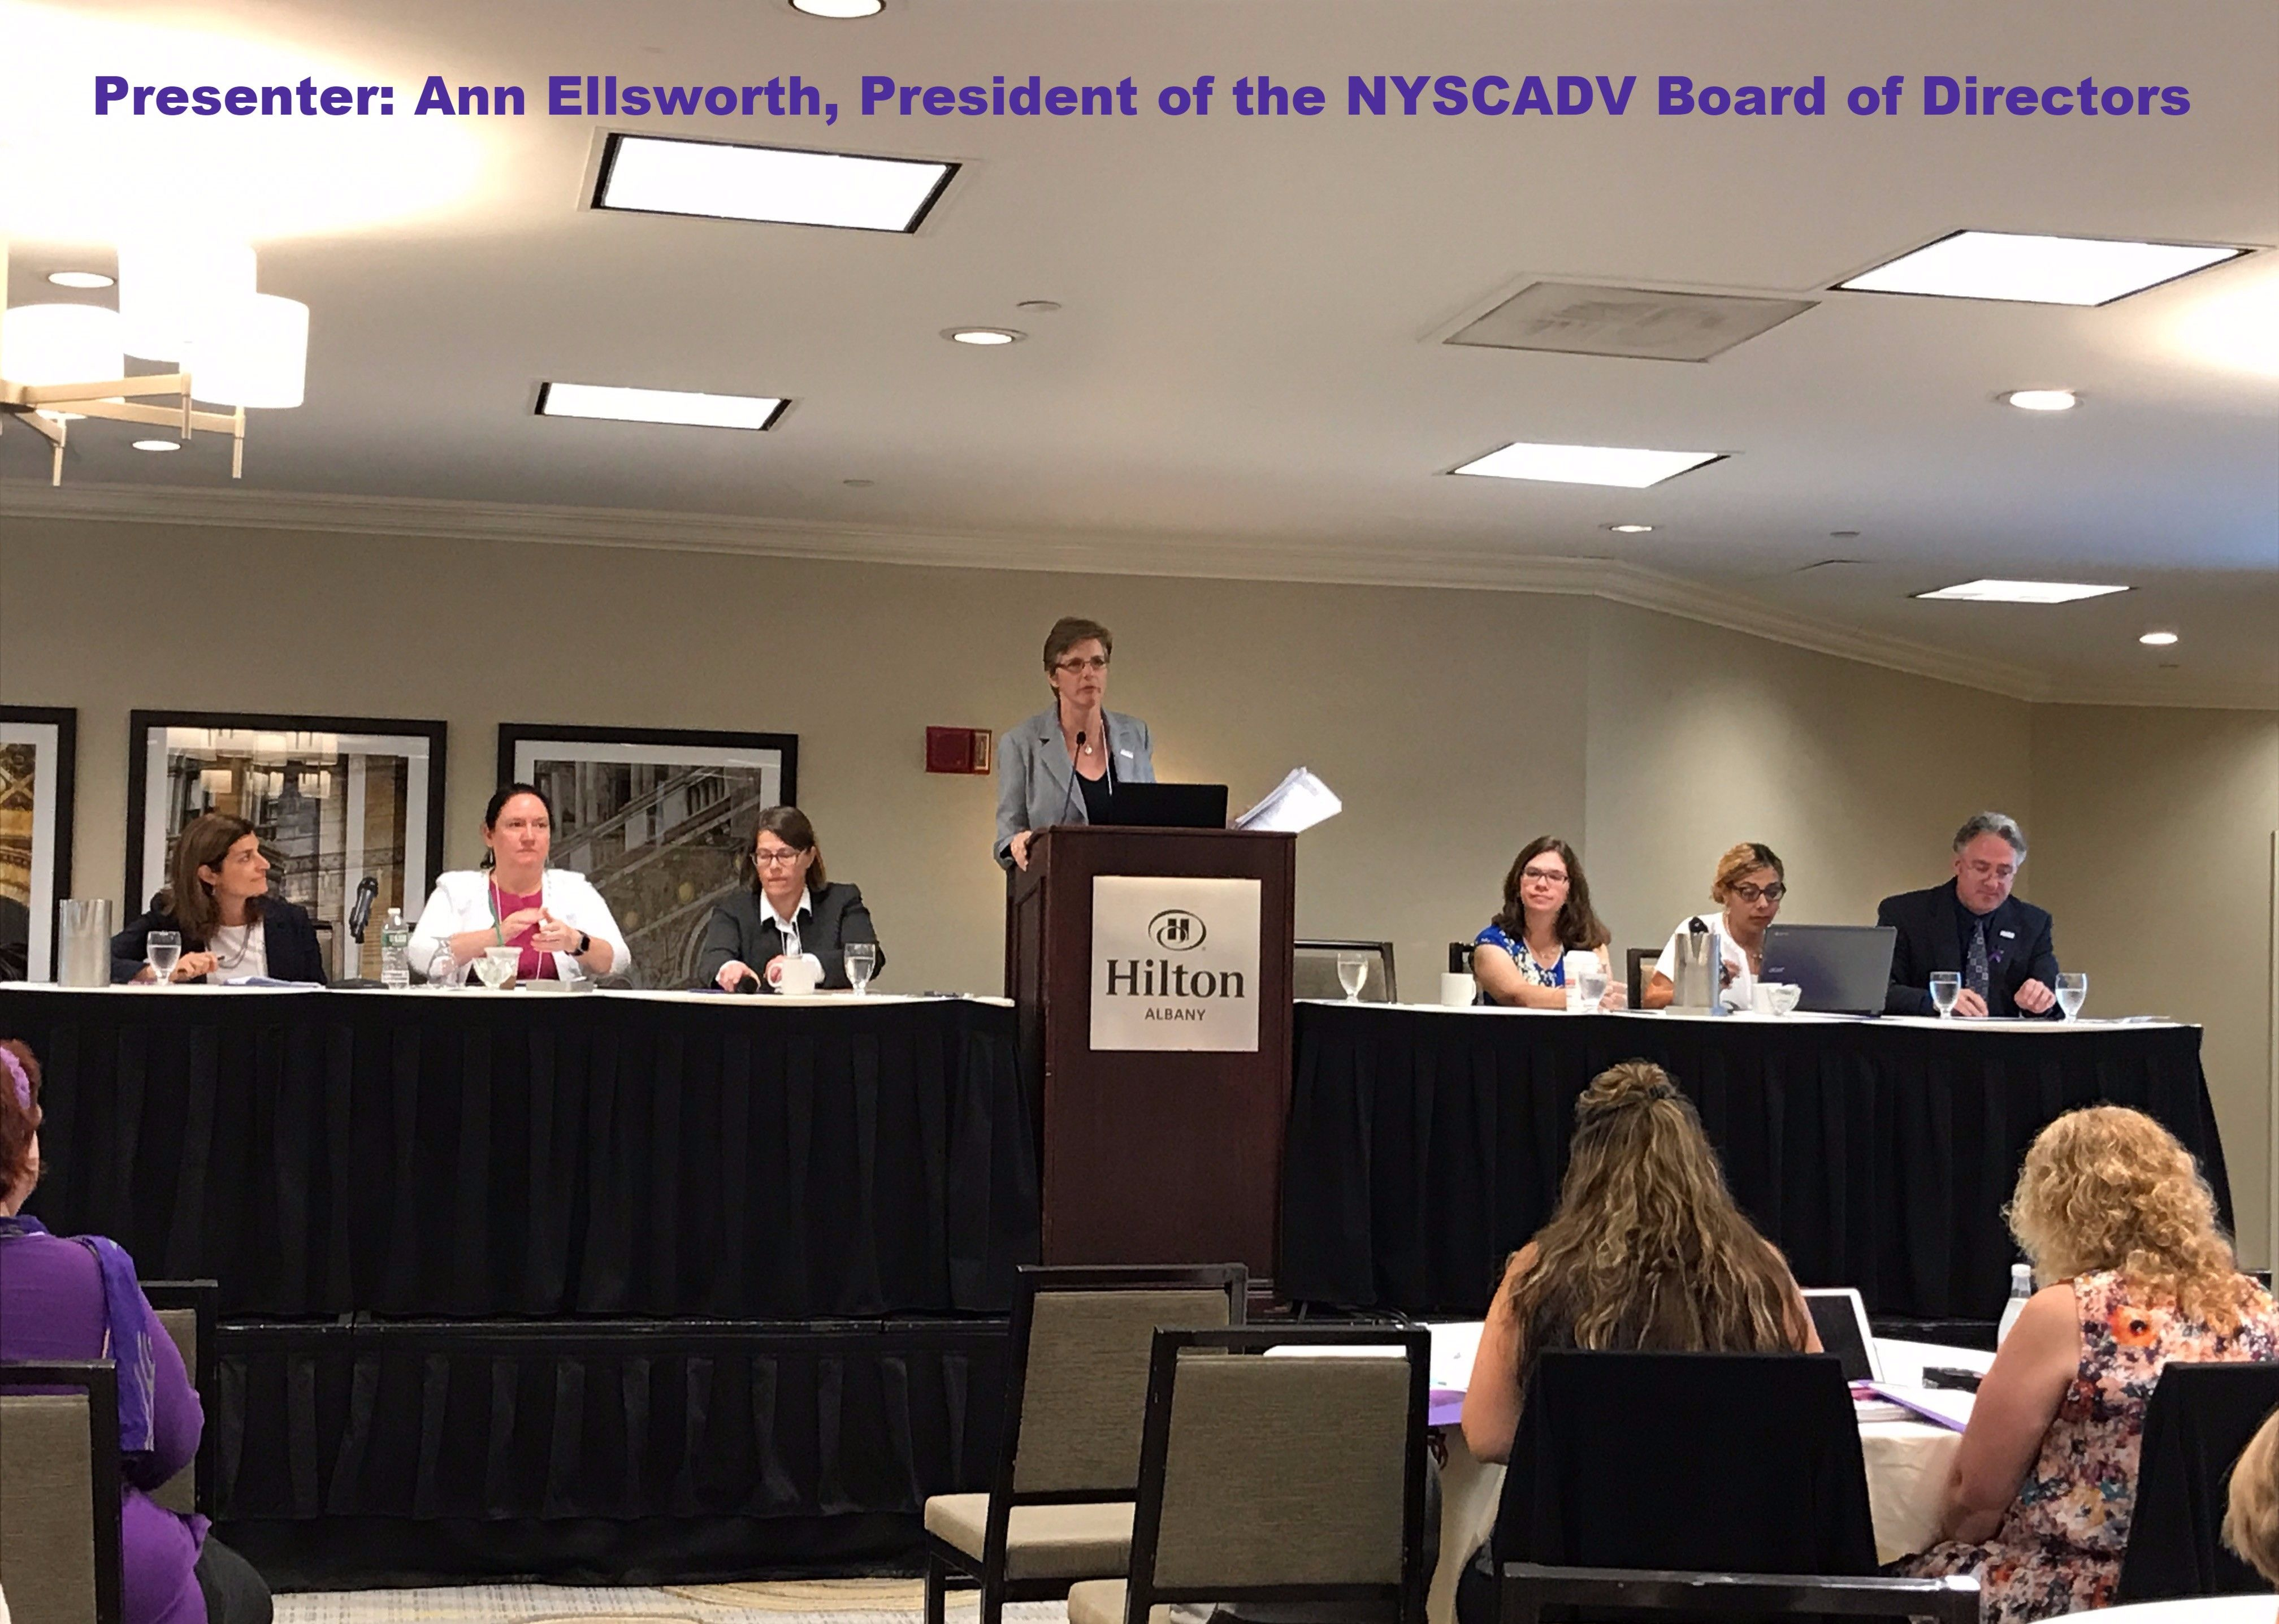 Recap of the 2017 NYSCADV Annual Meeting